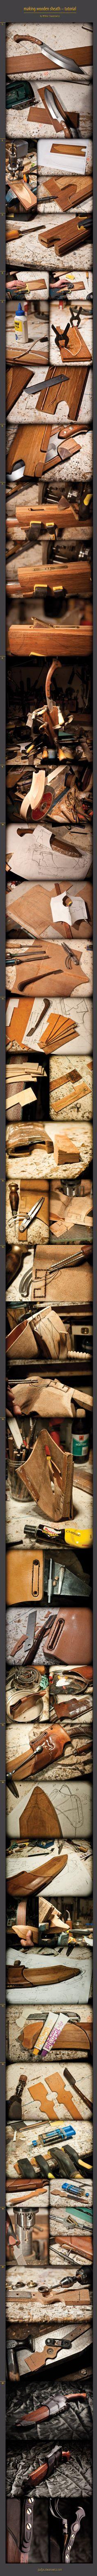 wooden sheath tutorial by WSi.deviantart.com on @deviantART